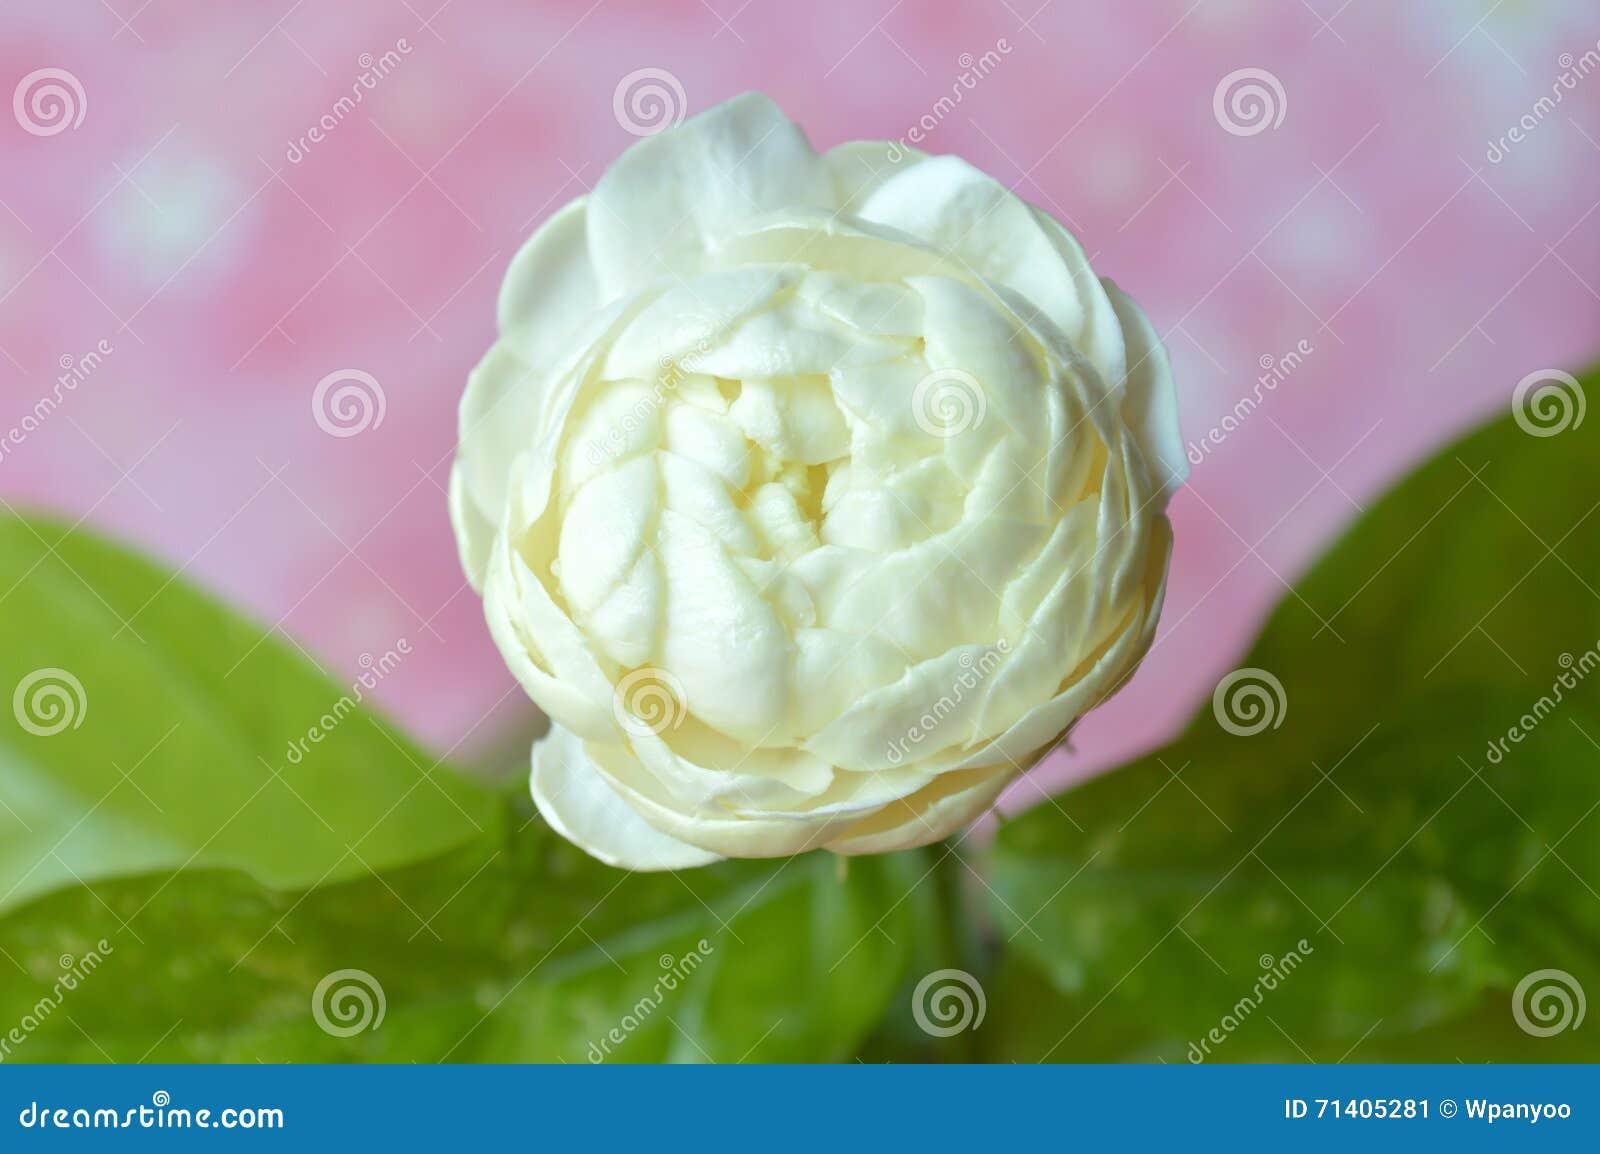 Jasmine flower stock image image of water thailand 71405281 royalty free stock photo izmirmasajfo Gallery